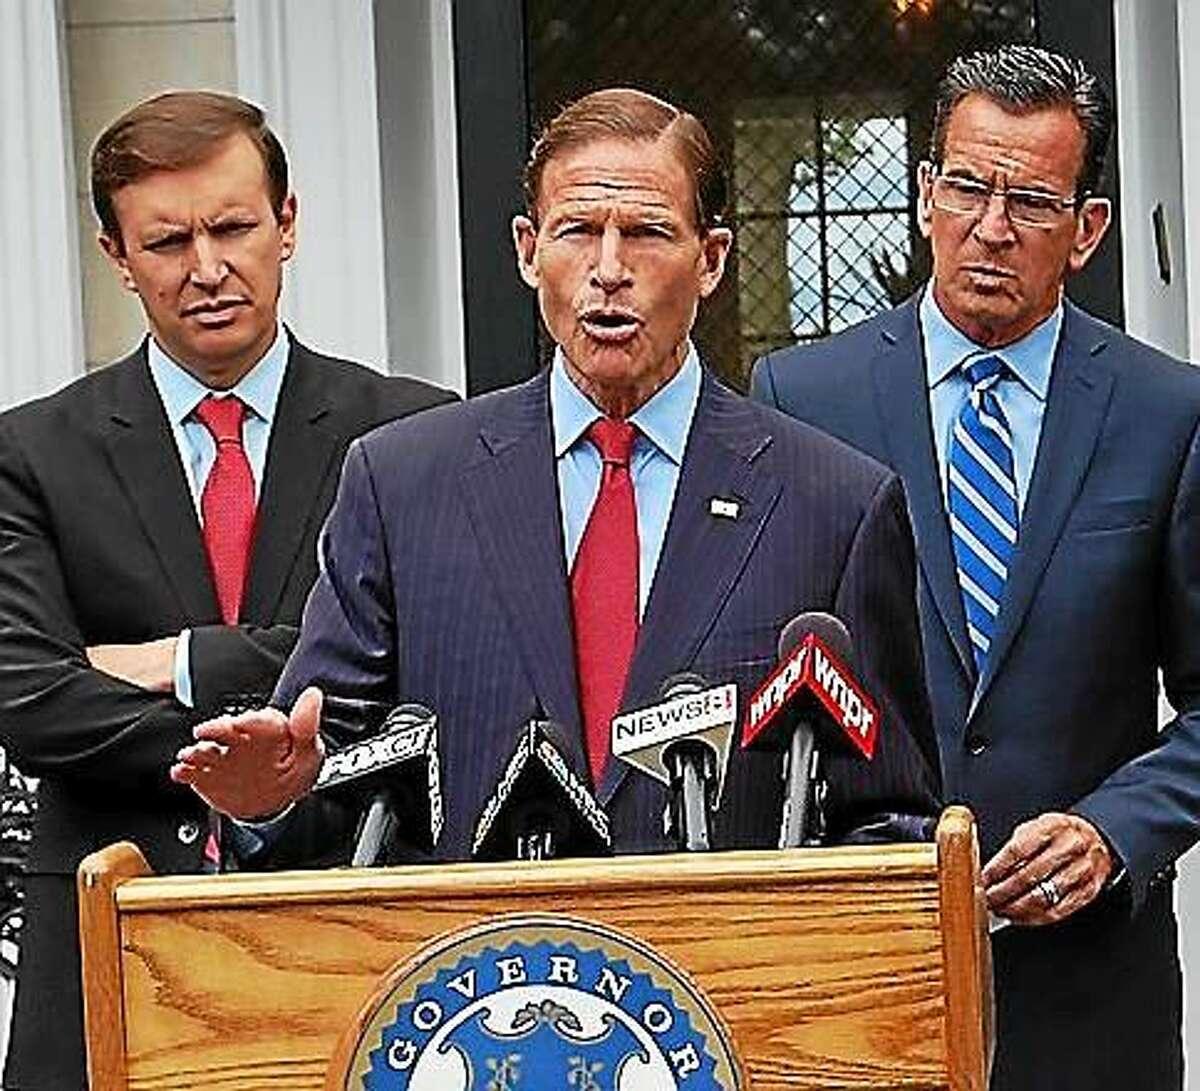 U.S. Sens. Richard Blumenthal (center), Chris Murphy (left) and Gov. Dannel P. Malloy (right)